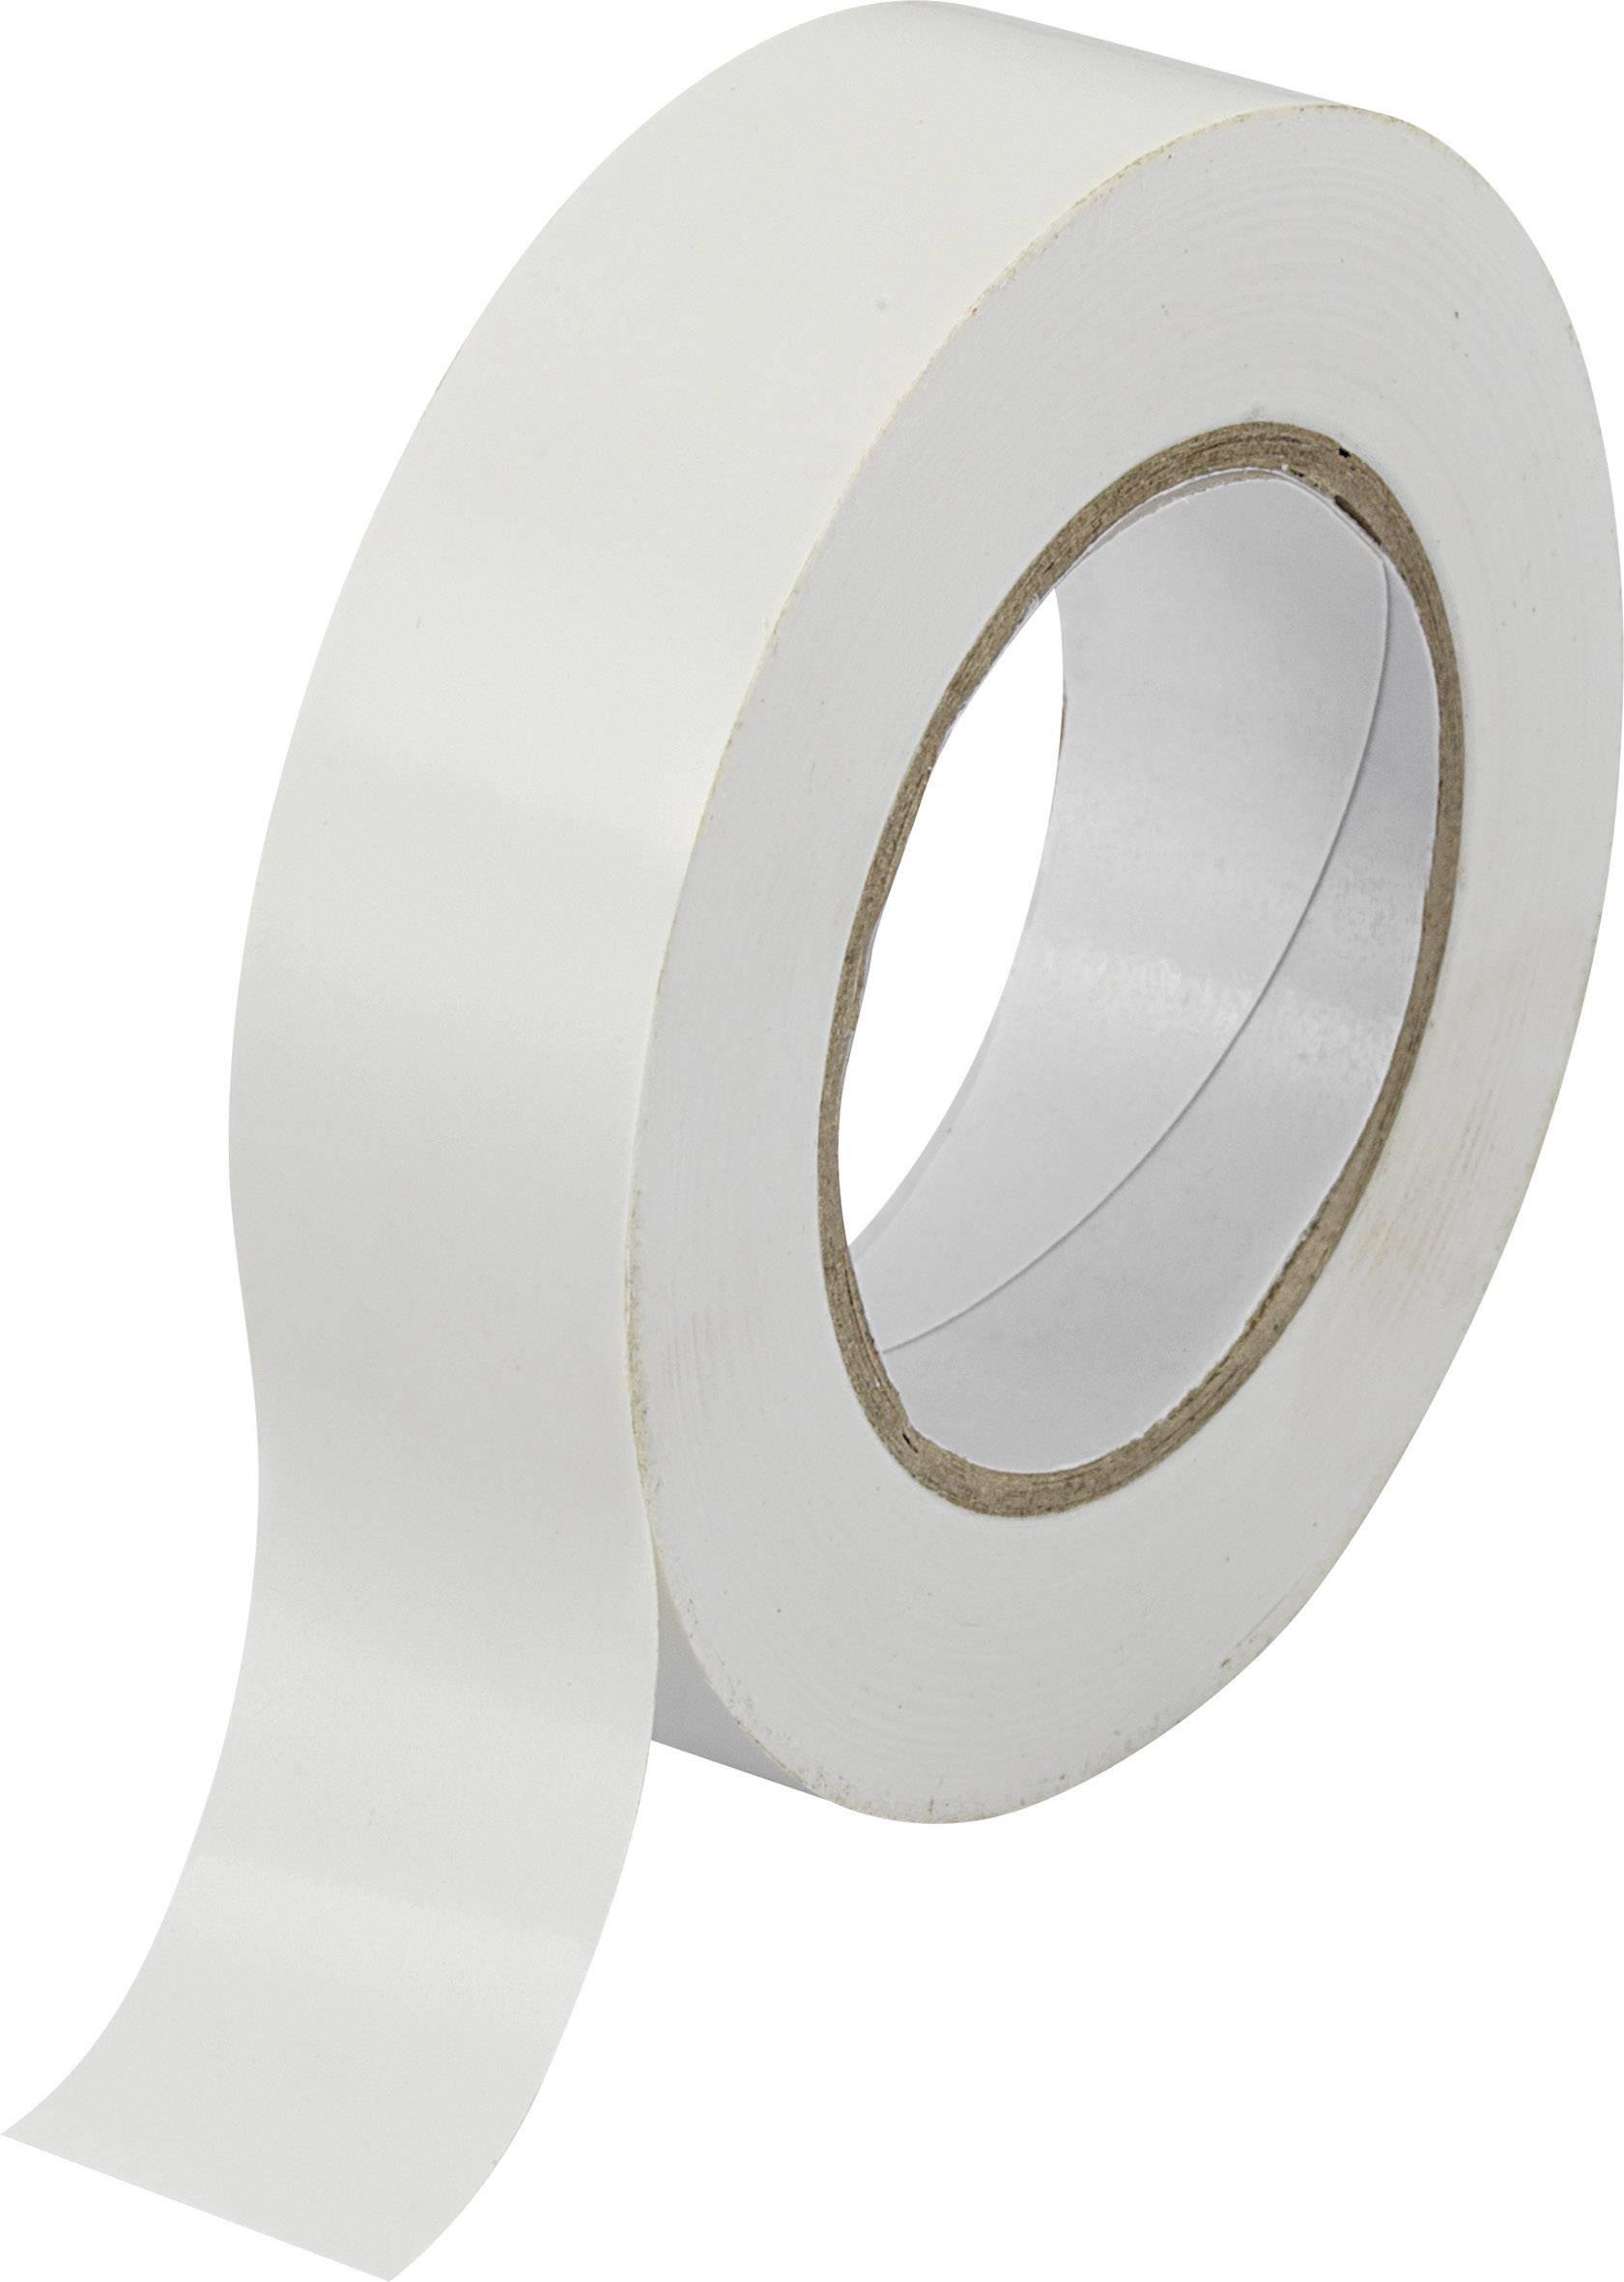 Izolační páska TRU COMPONENTS 1564010, (d x š) 25 m x 19 mm, bílá, 1 role